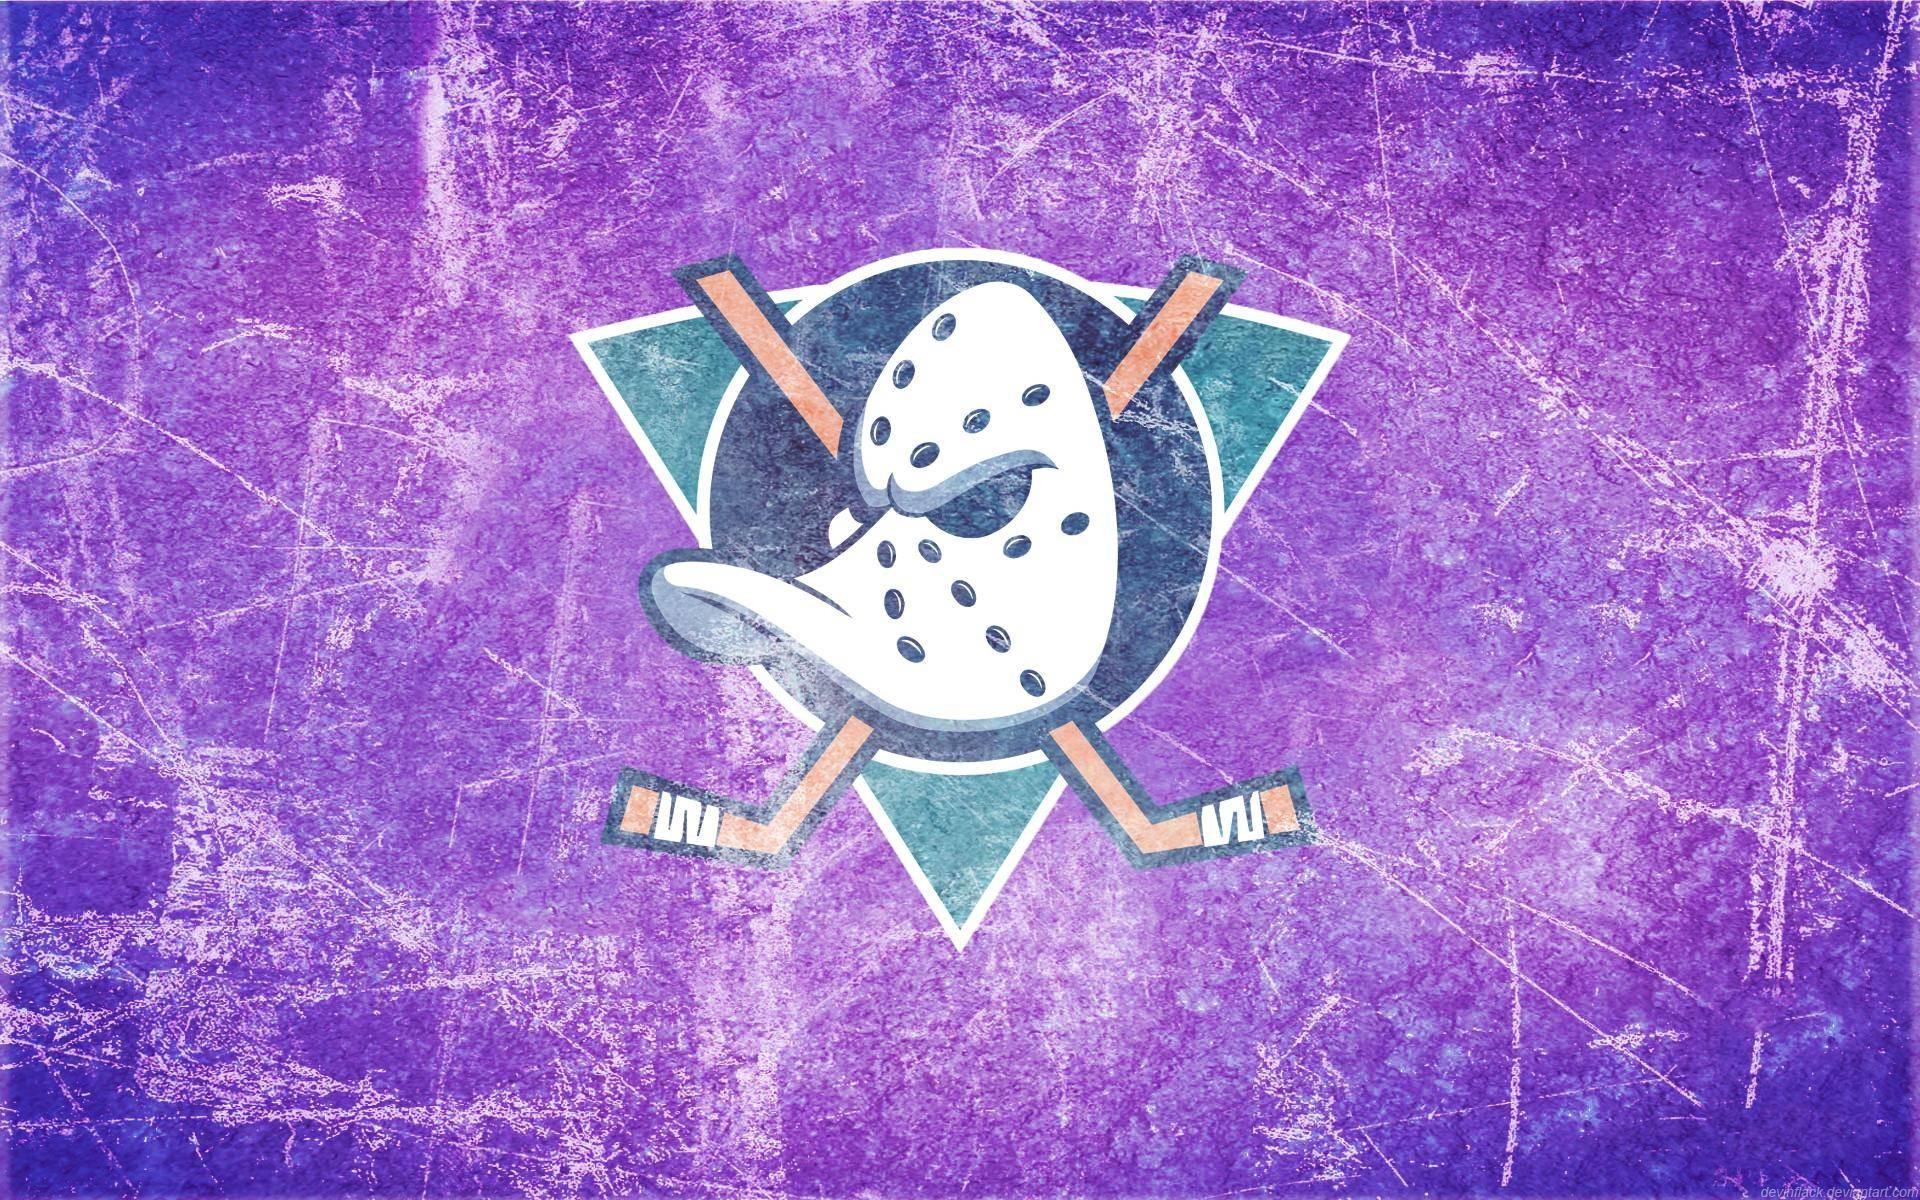 HD Anaheim Ducks 4k Wallpapers for Gadgets